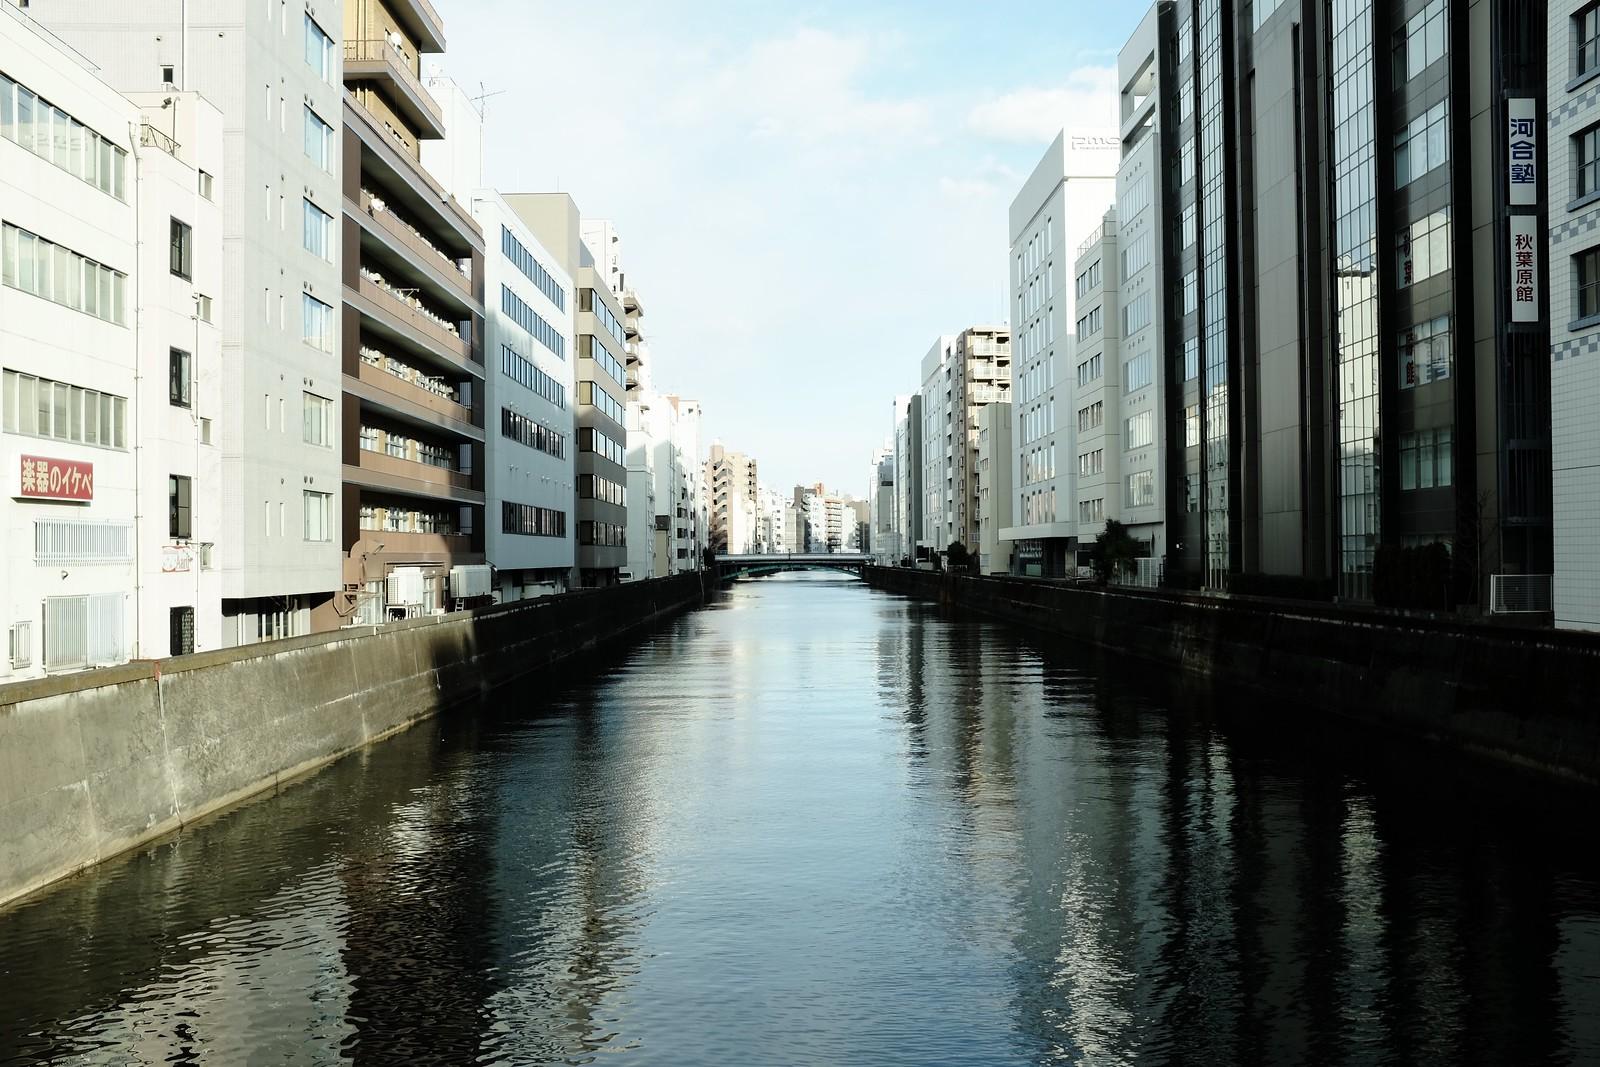 The Tokyo Photo